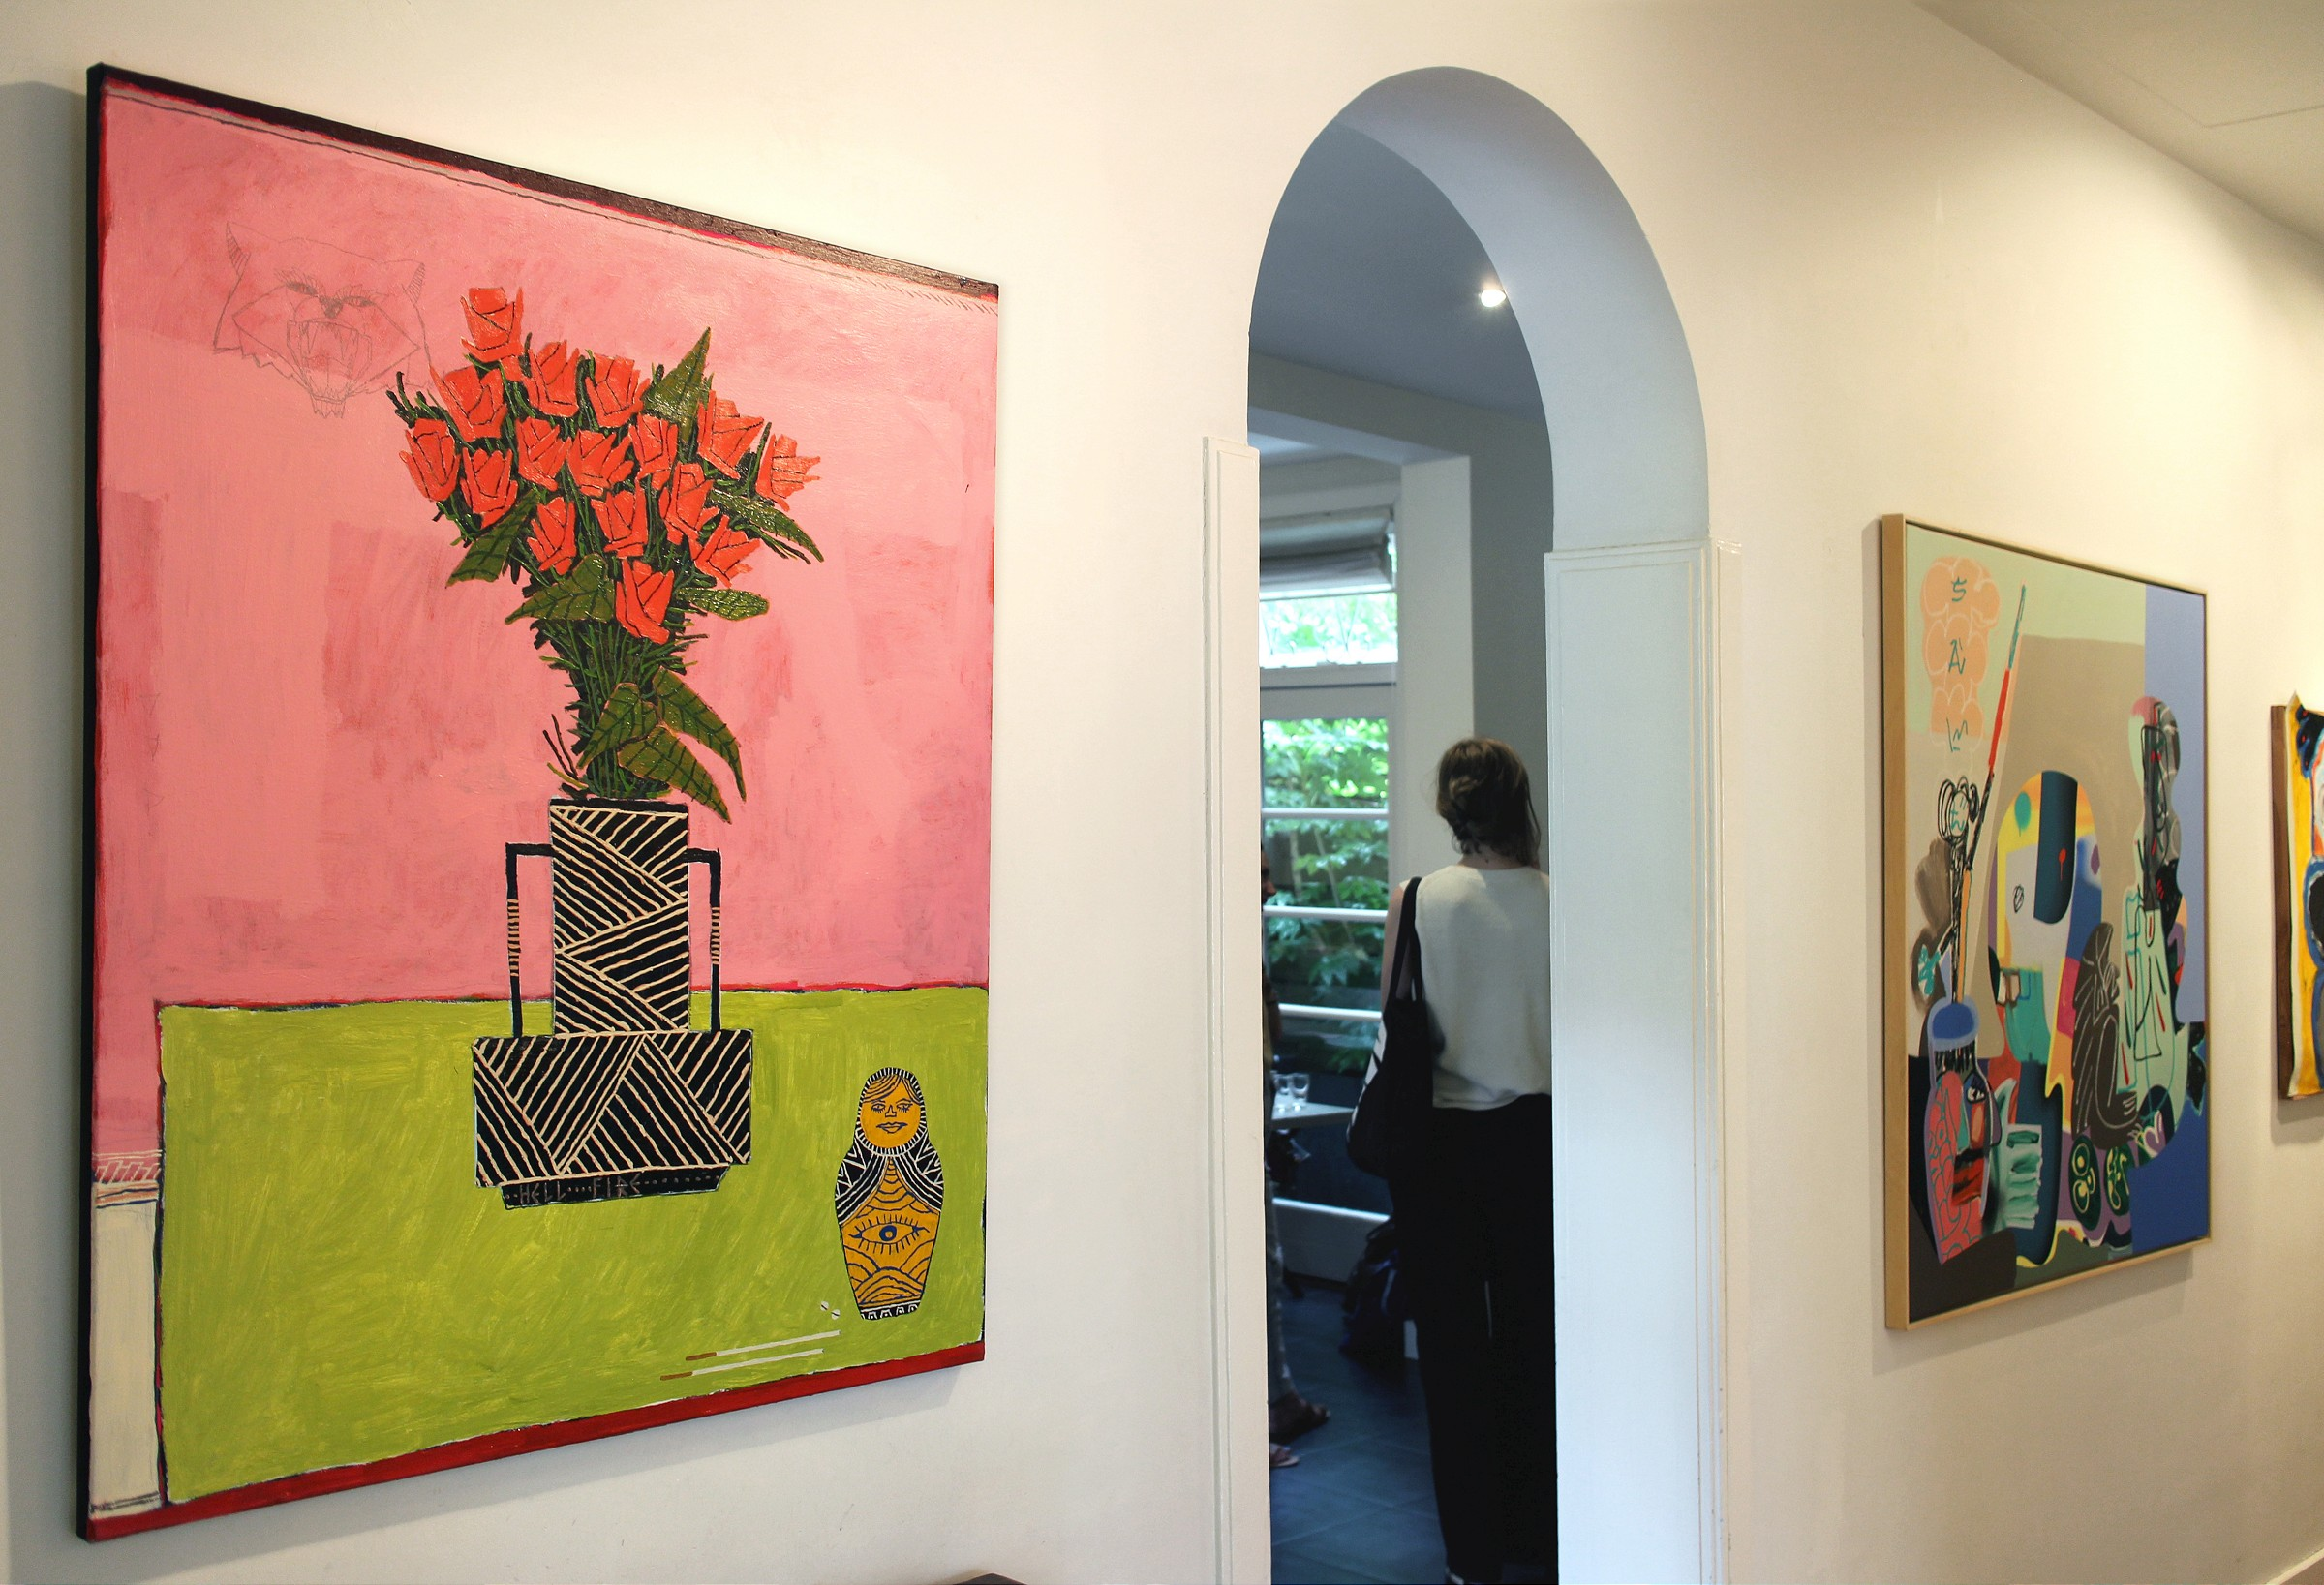 """DontGiveADamns"" na galeria Marian Cramer Projects em Amsterdão"